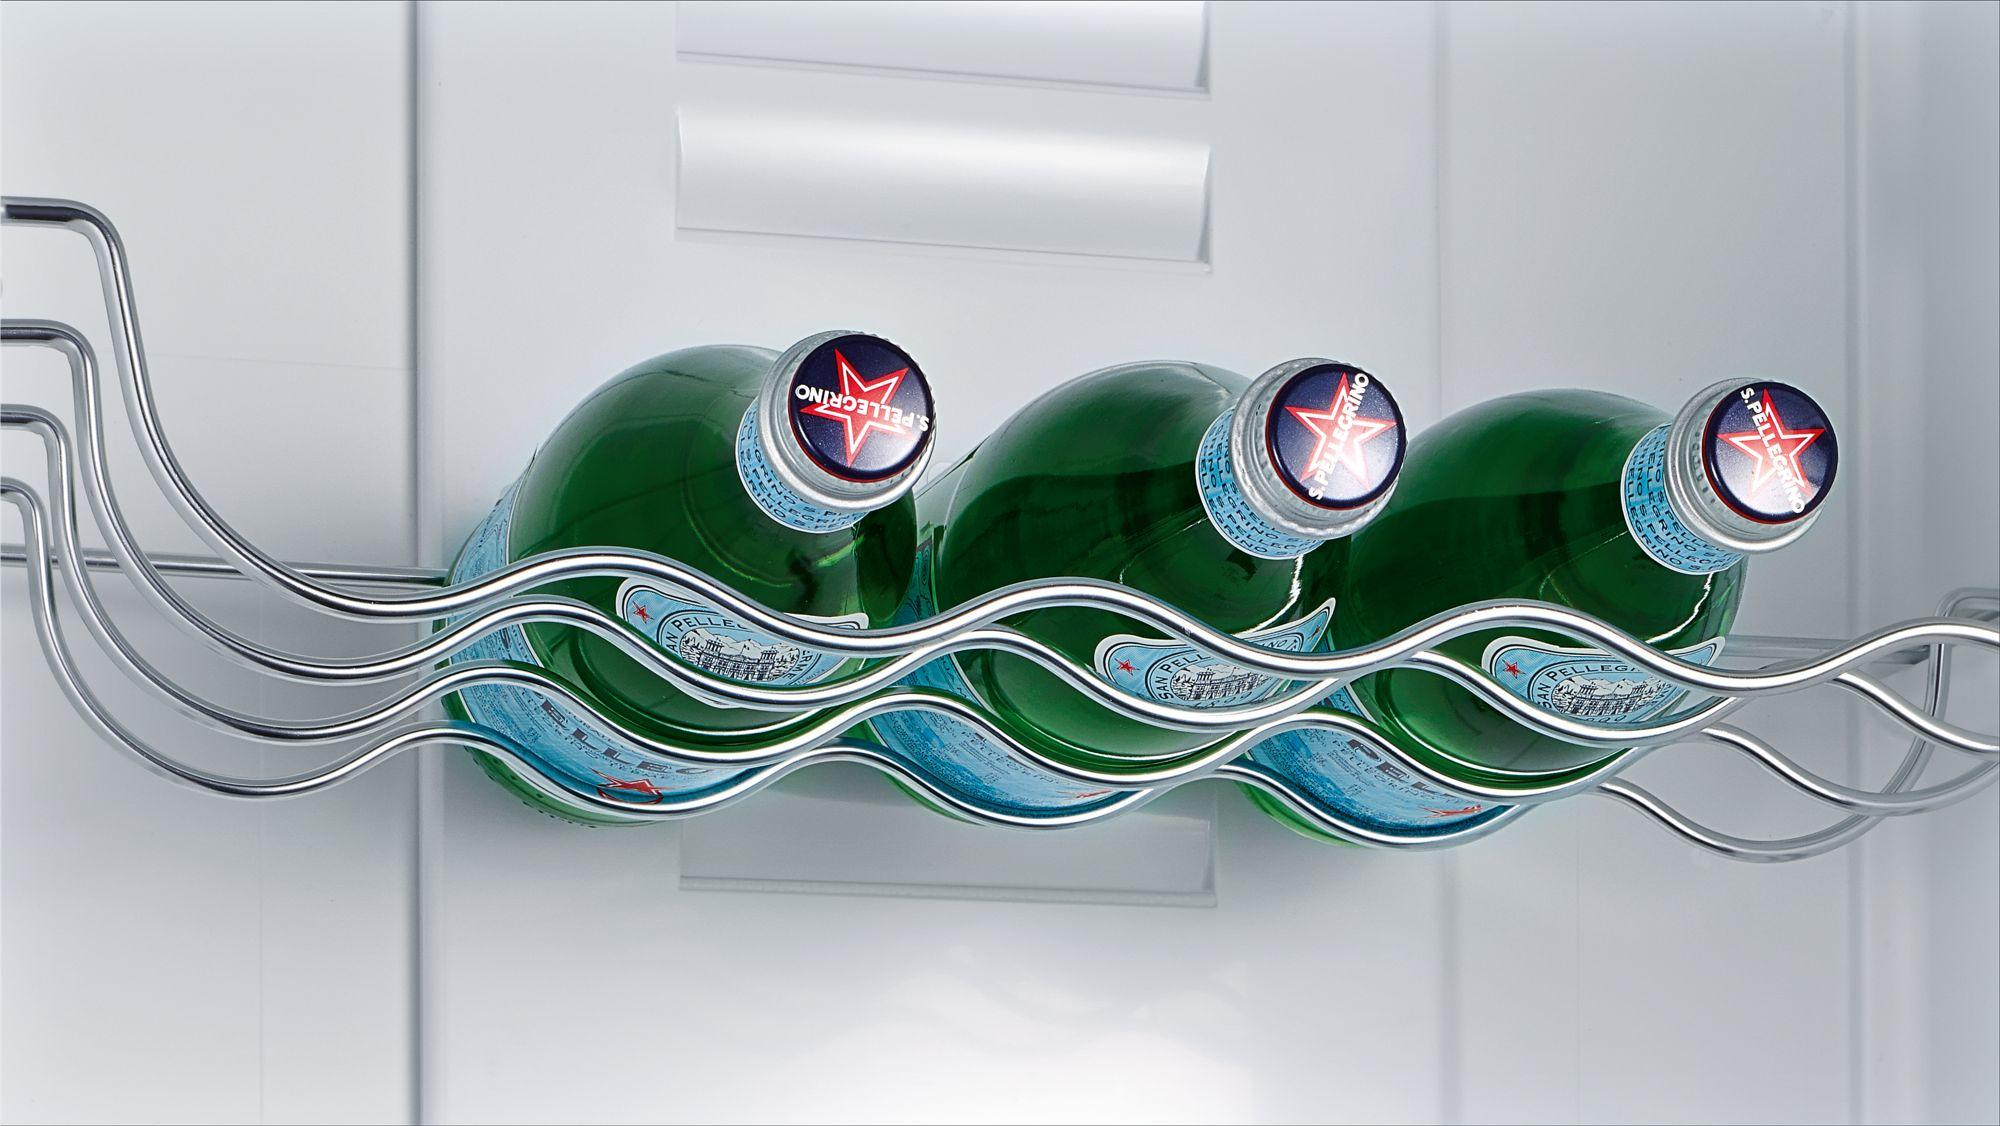 Siemens Kühlschrank Einbau : Siemens ki lv a einbau kühlschrank cm breit fresh box